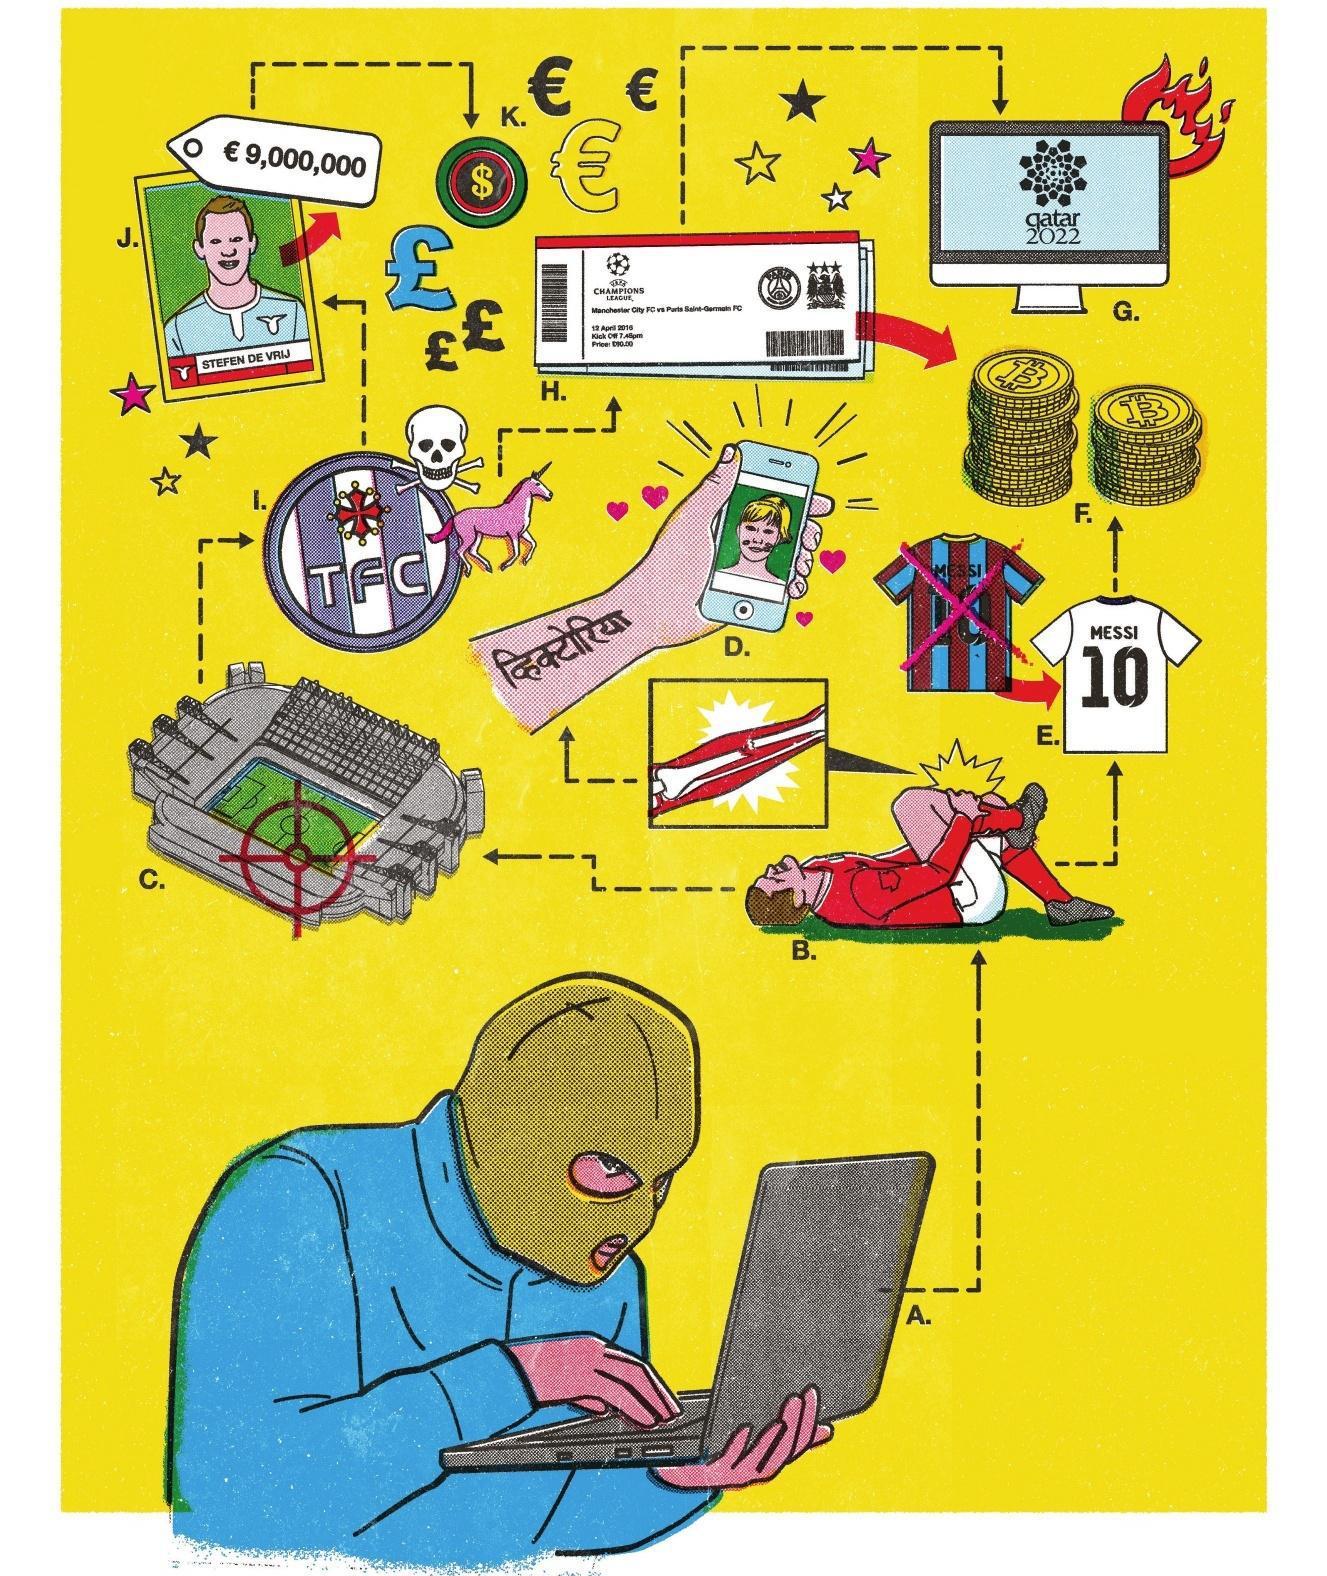 Texte Clément Le Foll | Illustrations Tobatron